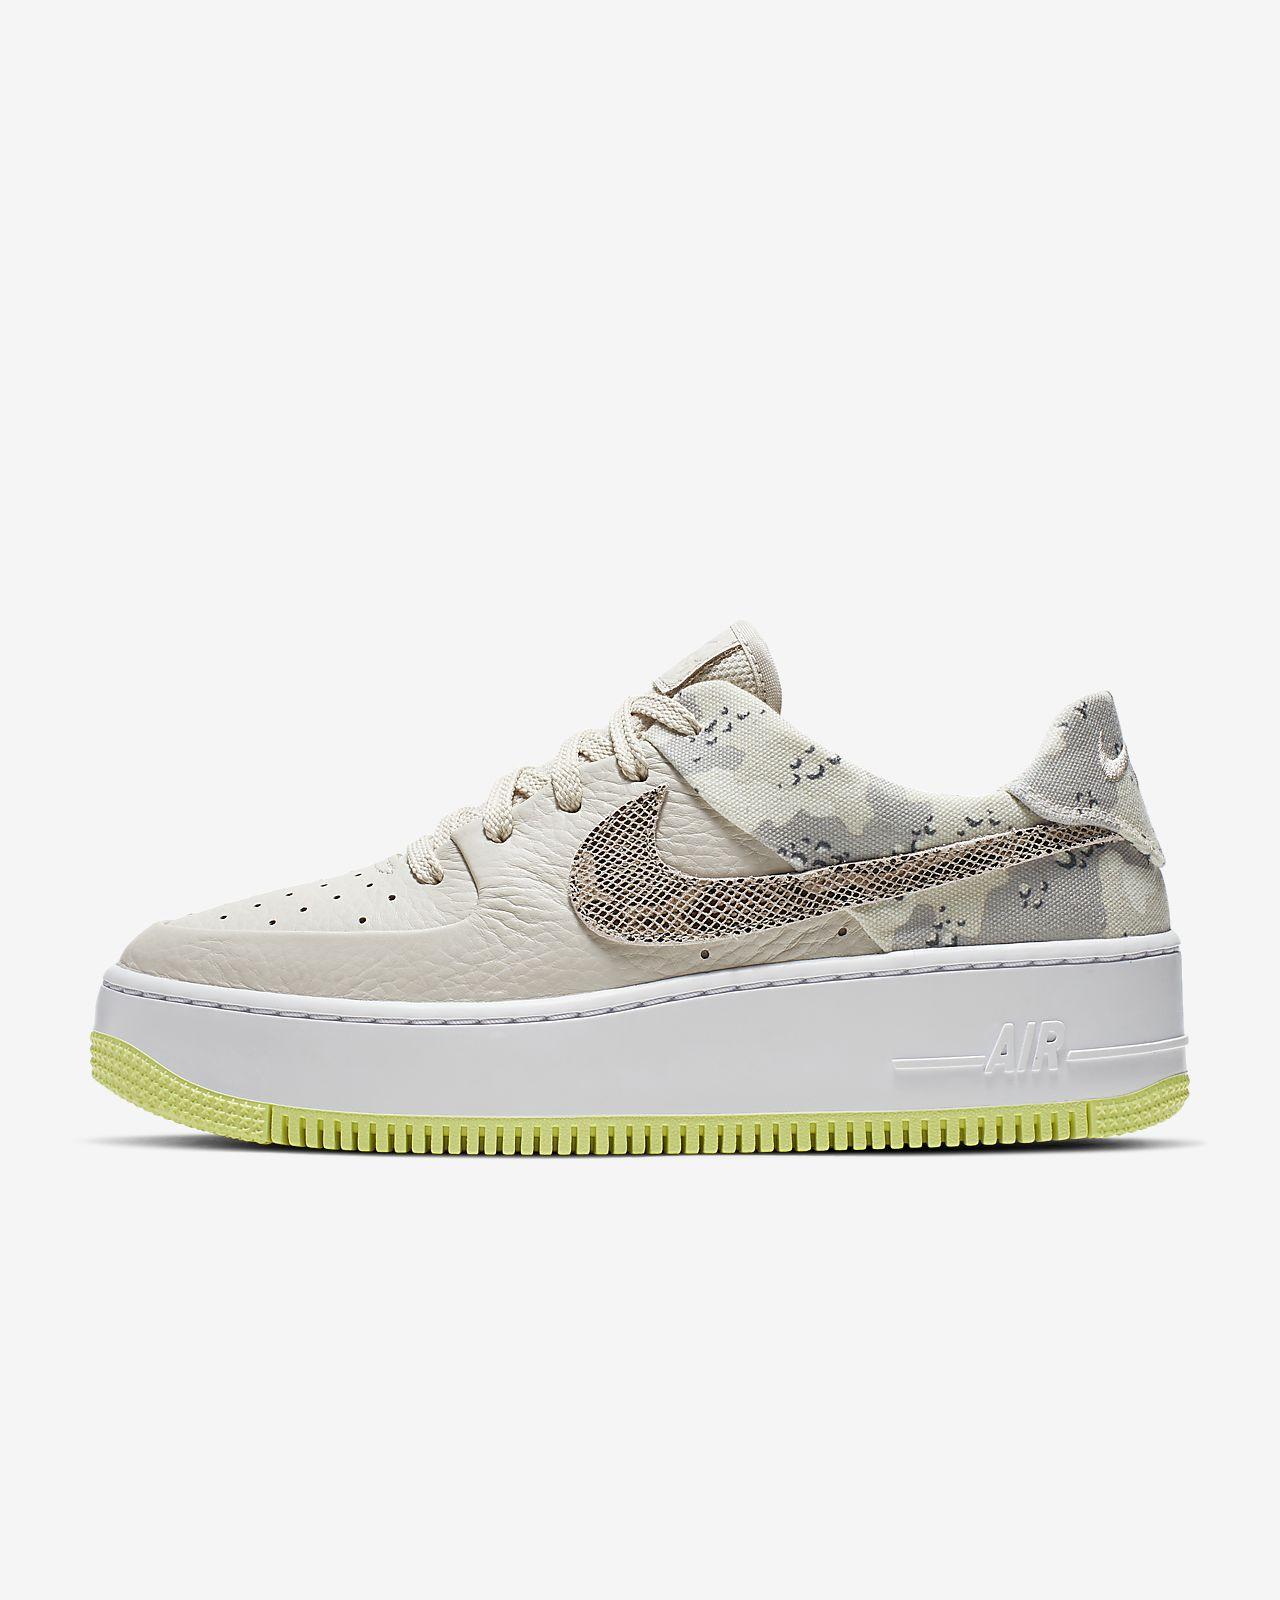 competitive price ec4f8 330d3 Nike Air Force 1 Sage Low Premium Camo-sko til kvinder. Nike.com DK